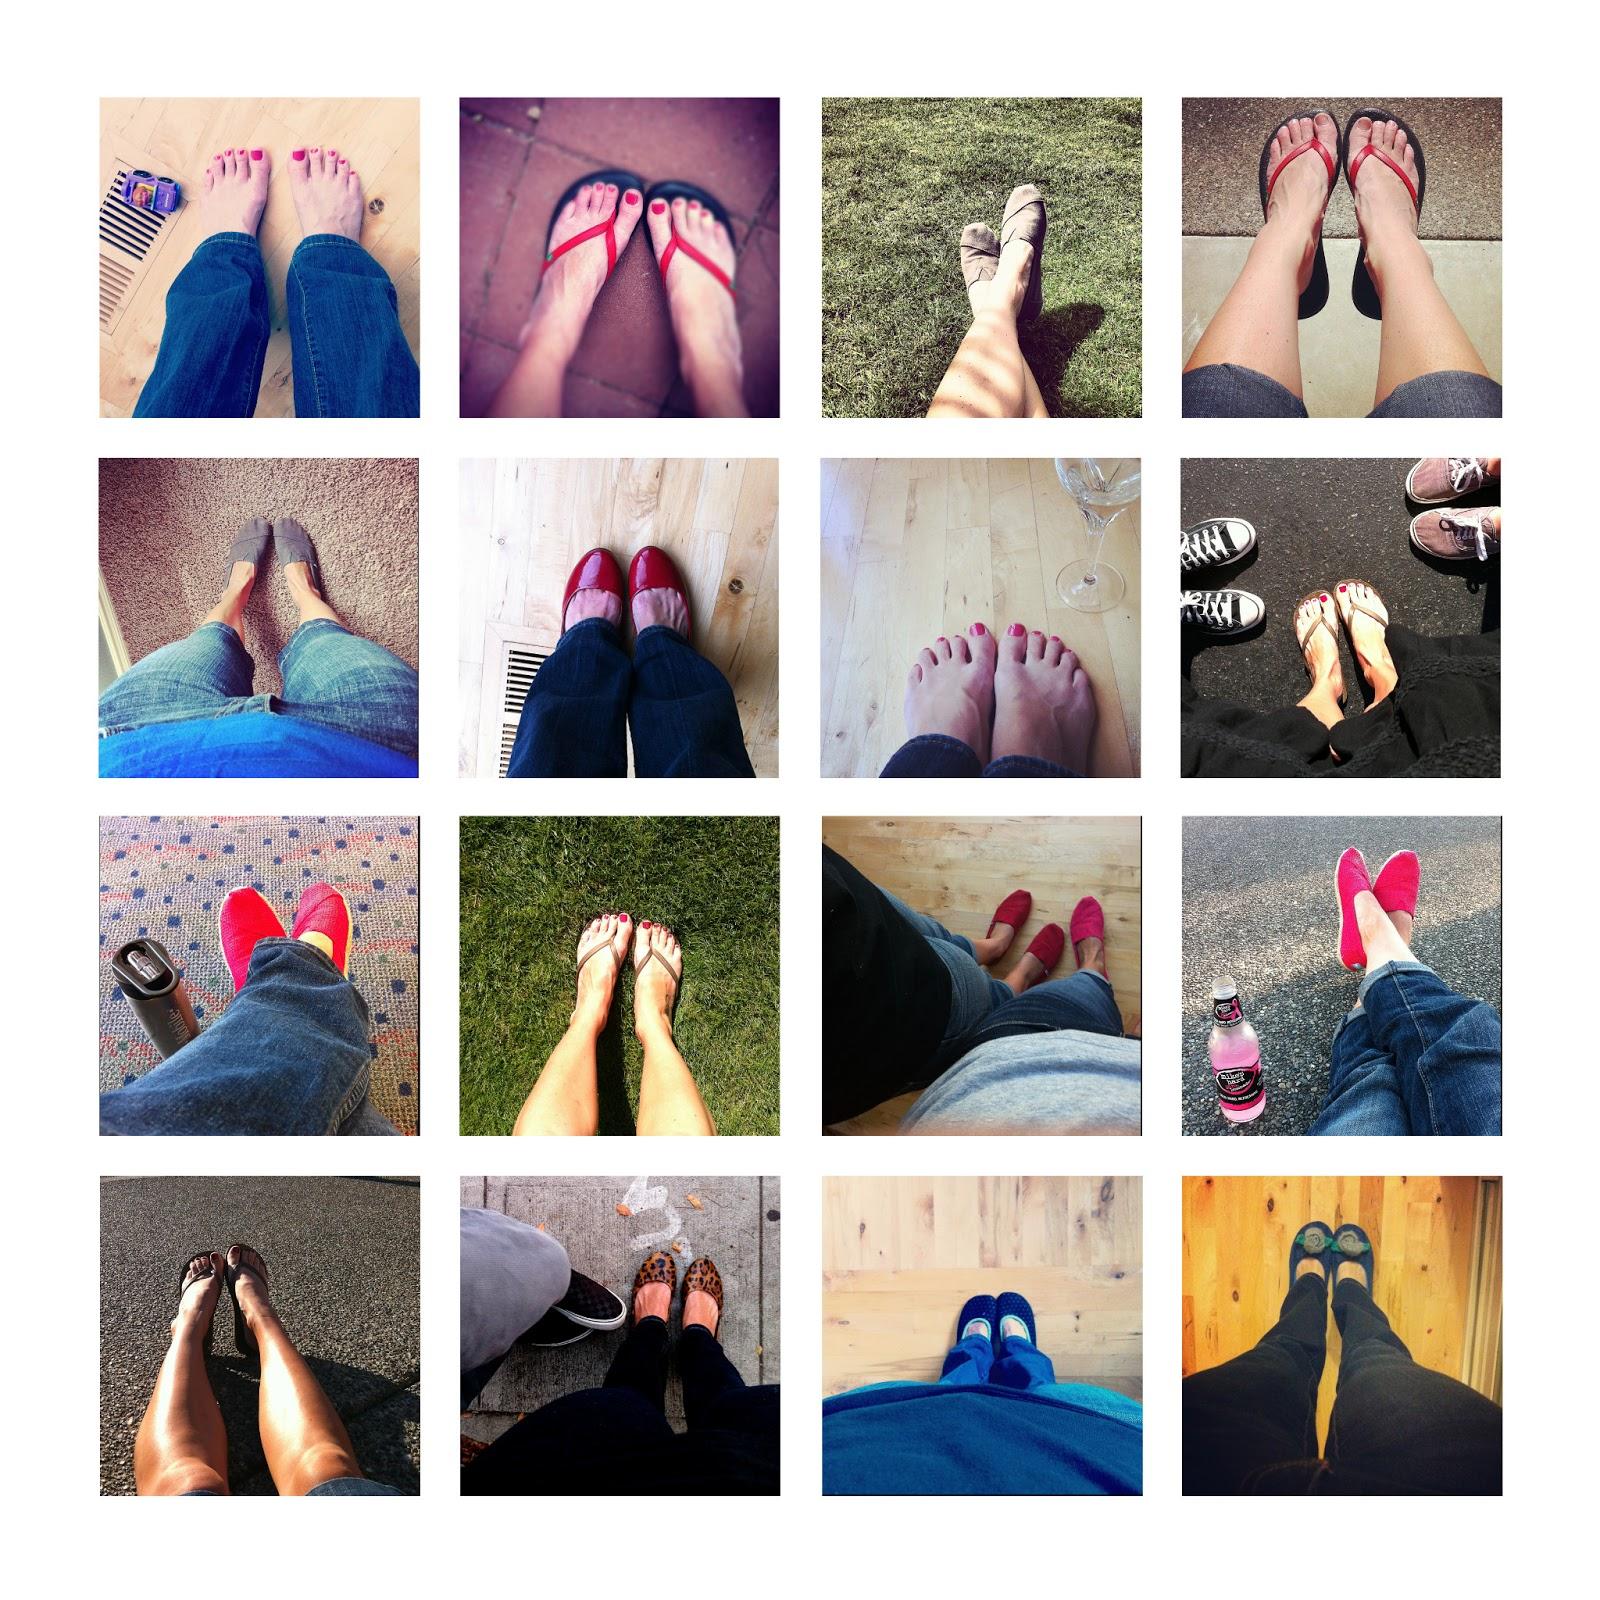 feet2012